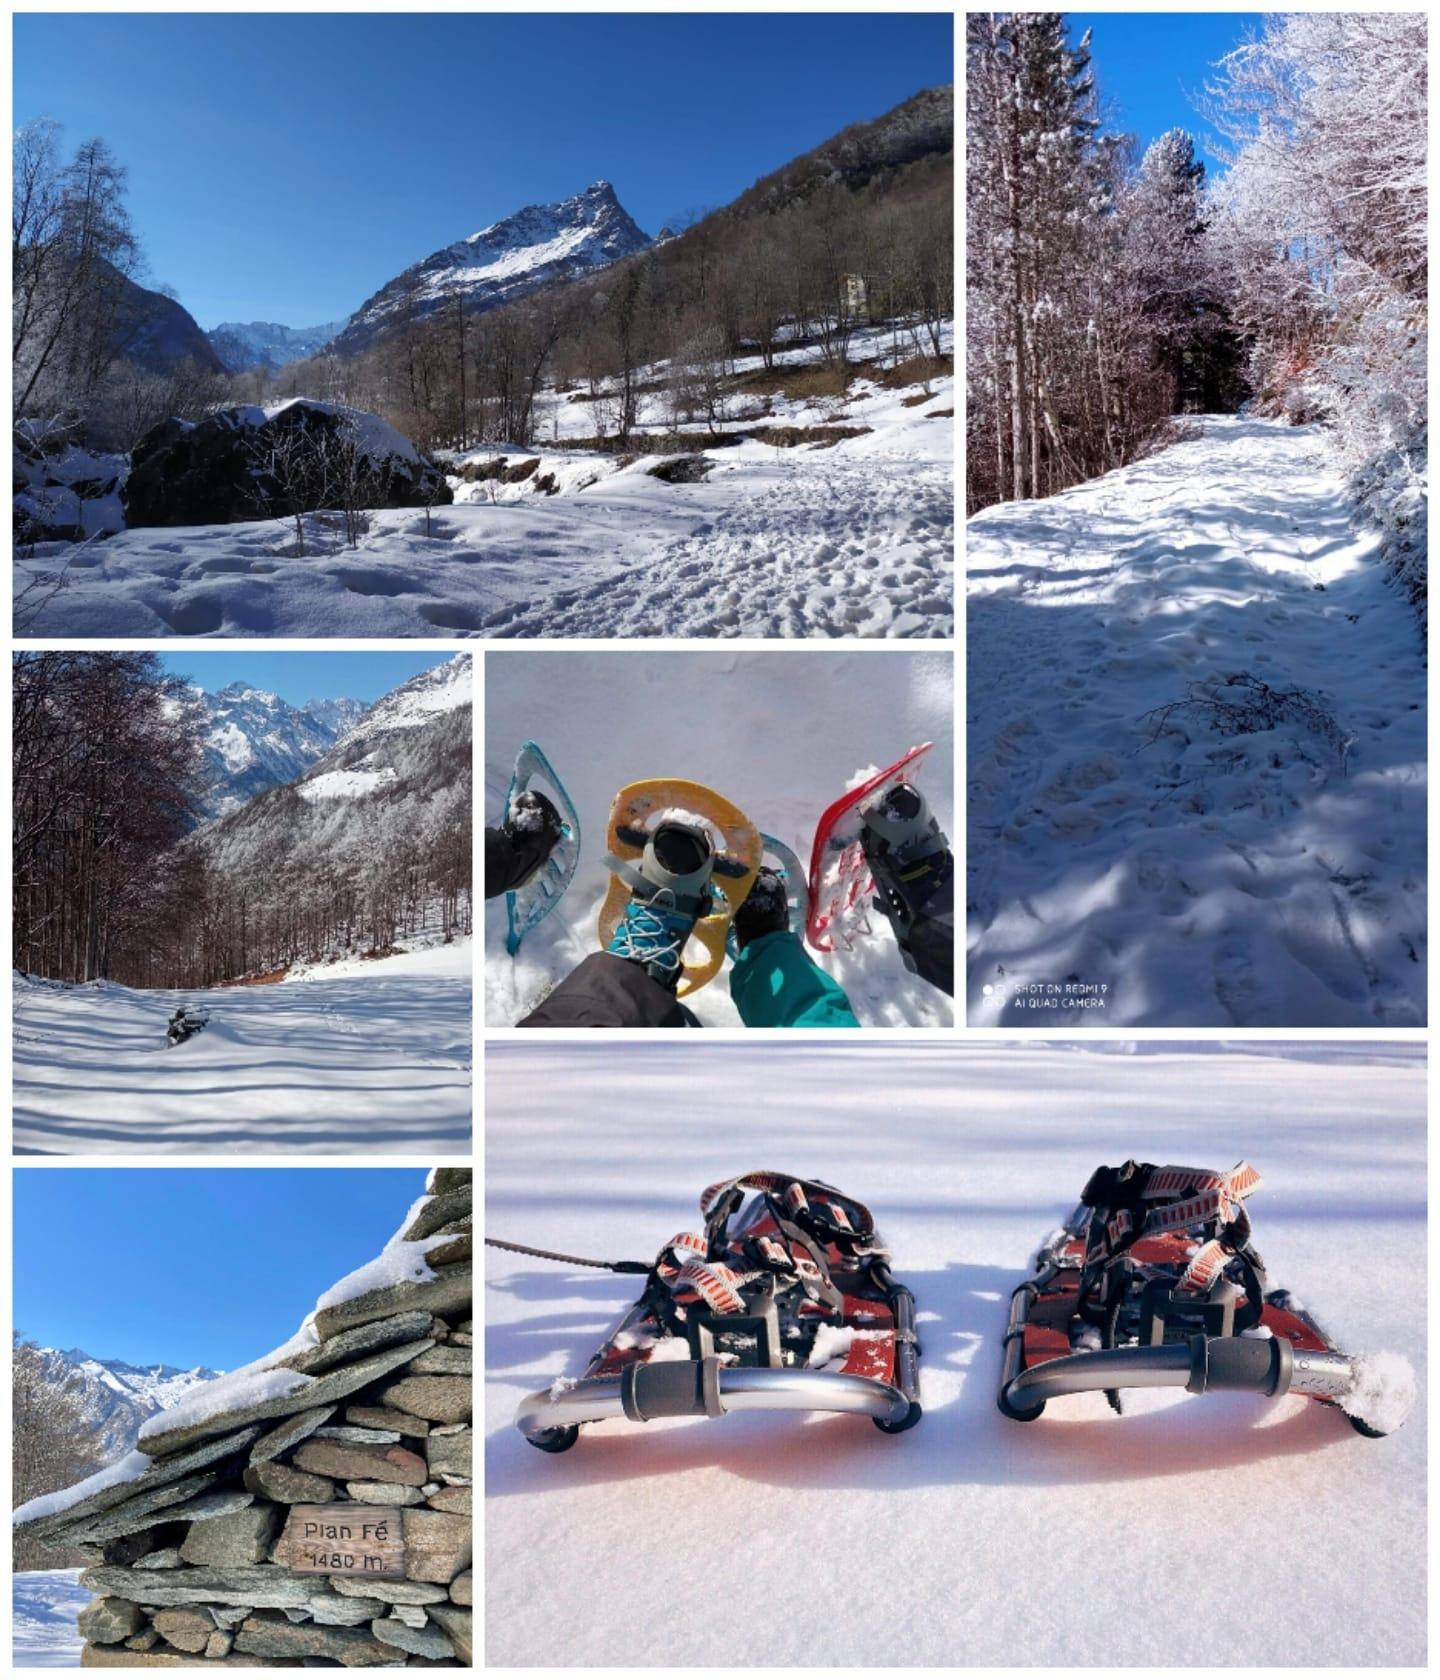 Welcome Piemonte, Experience, Colle del Lys, Torino, Piemonte